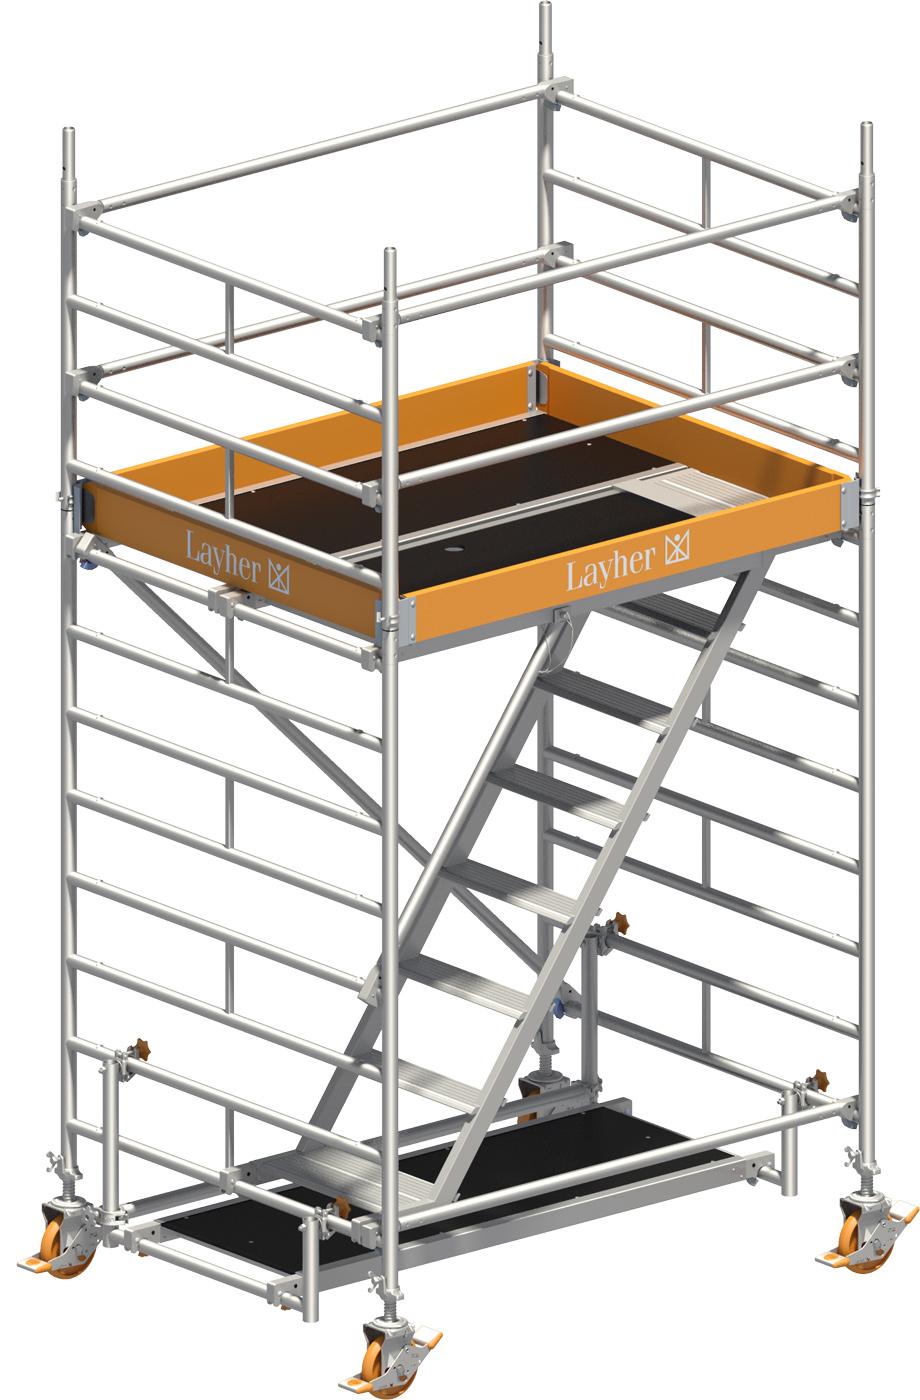 Treppengerüst Layher Uni Komfort 4201